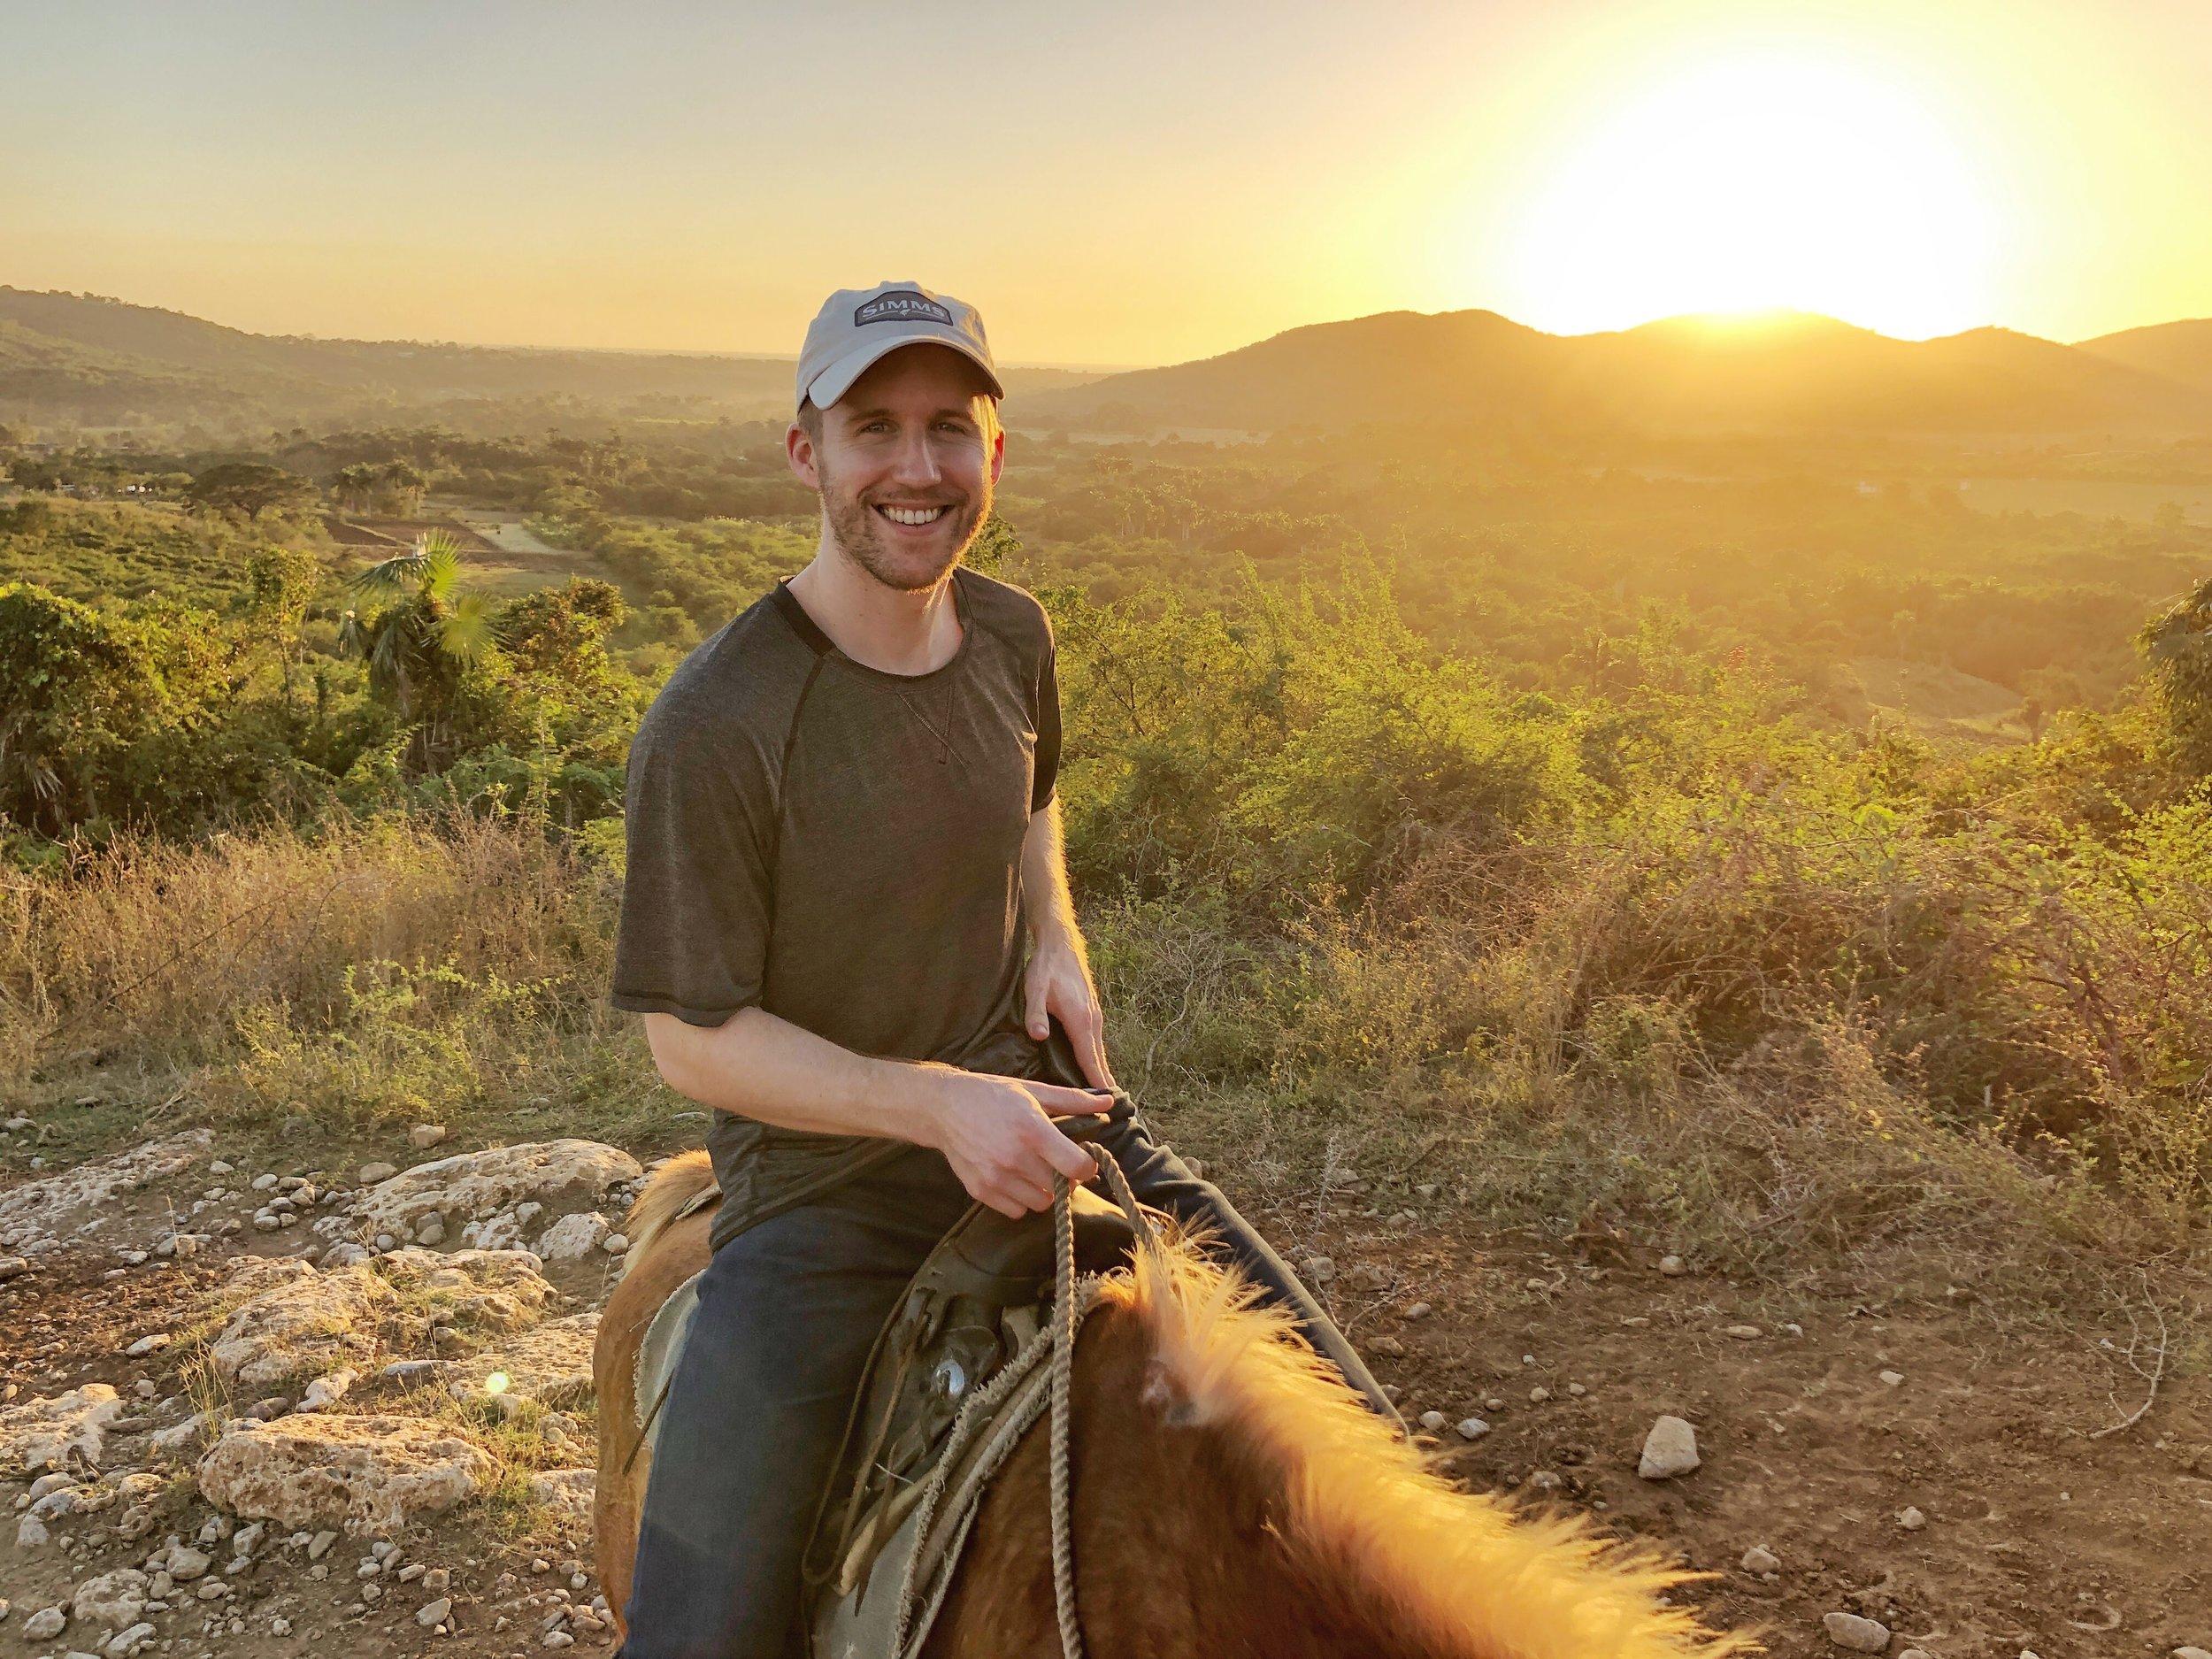 Trinidad - Horseback riding through sugar cane fields